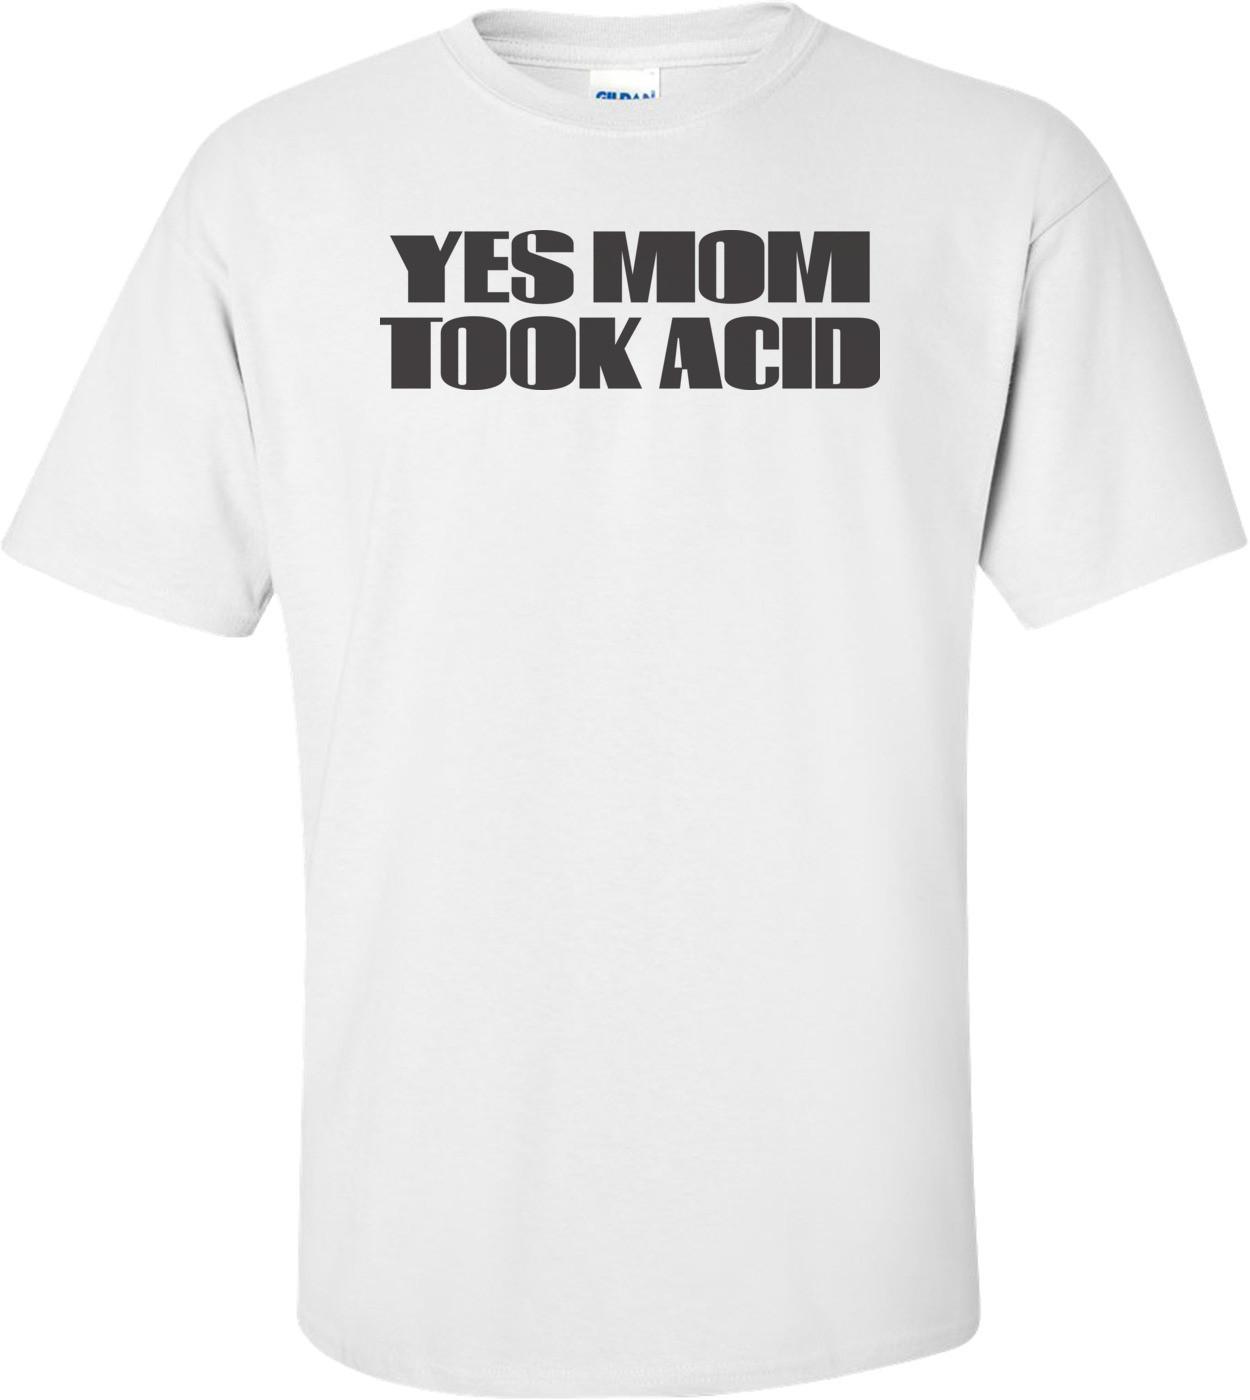 Yes Mom Took Acid Shirt